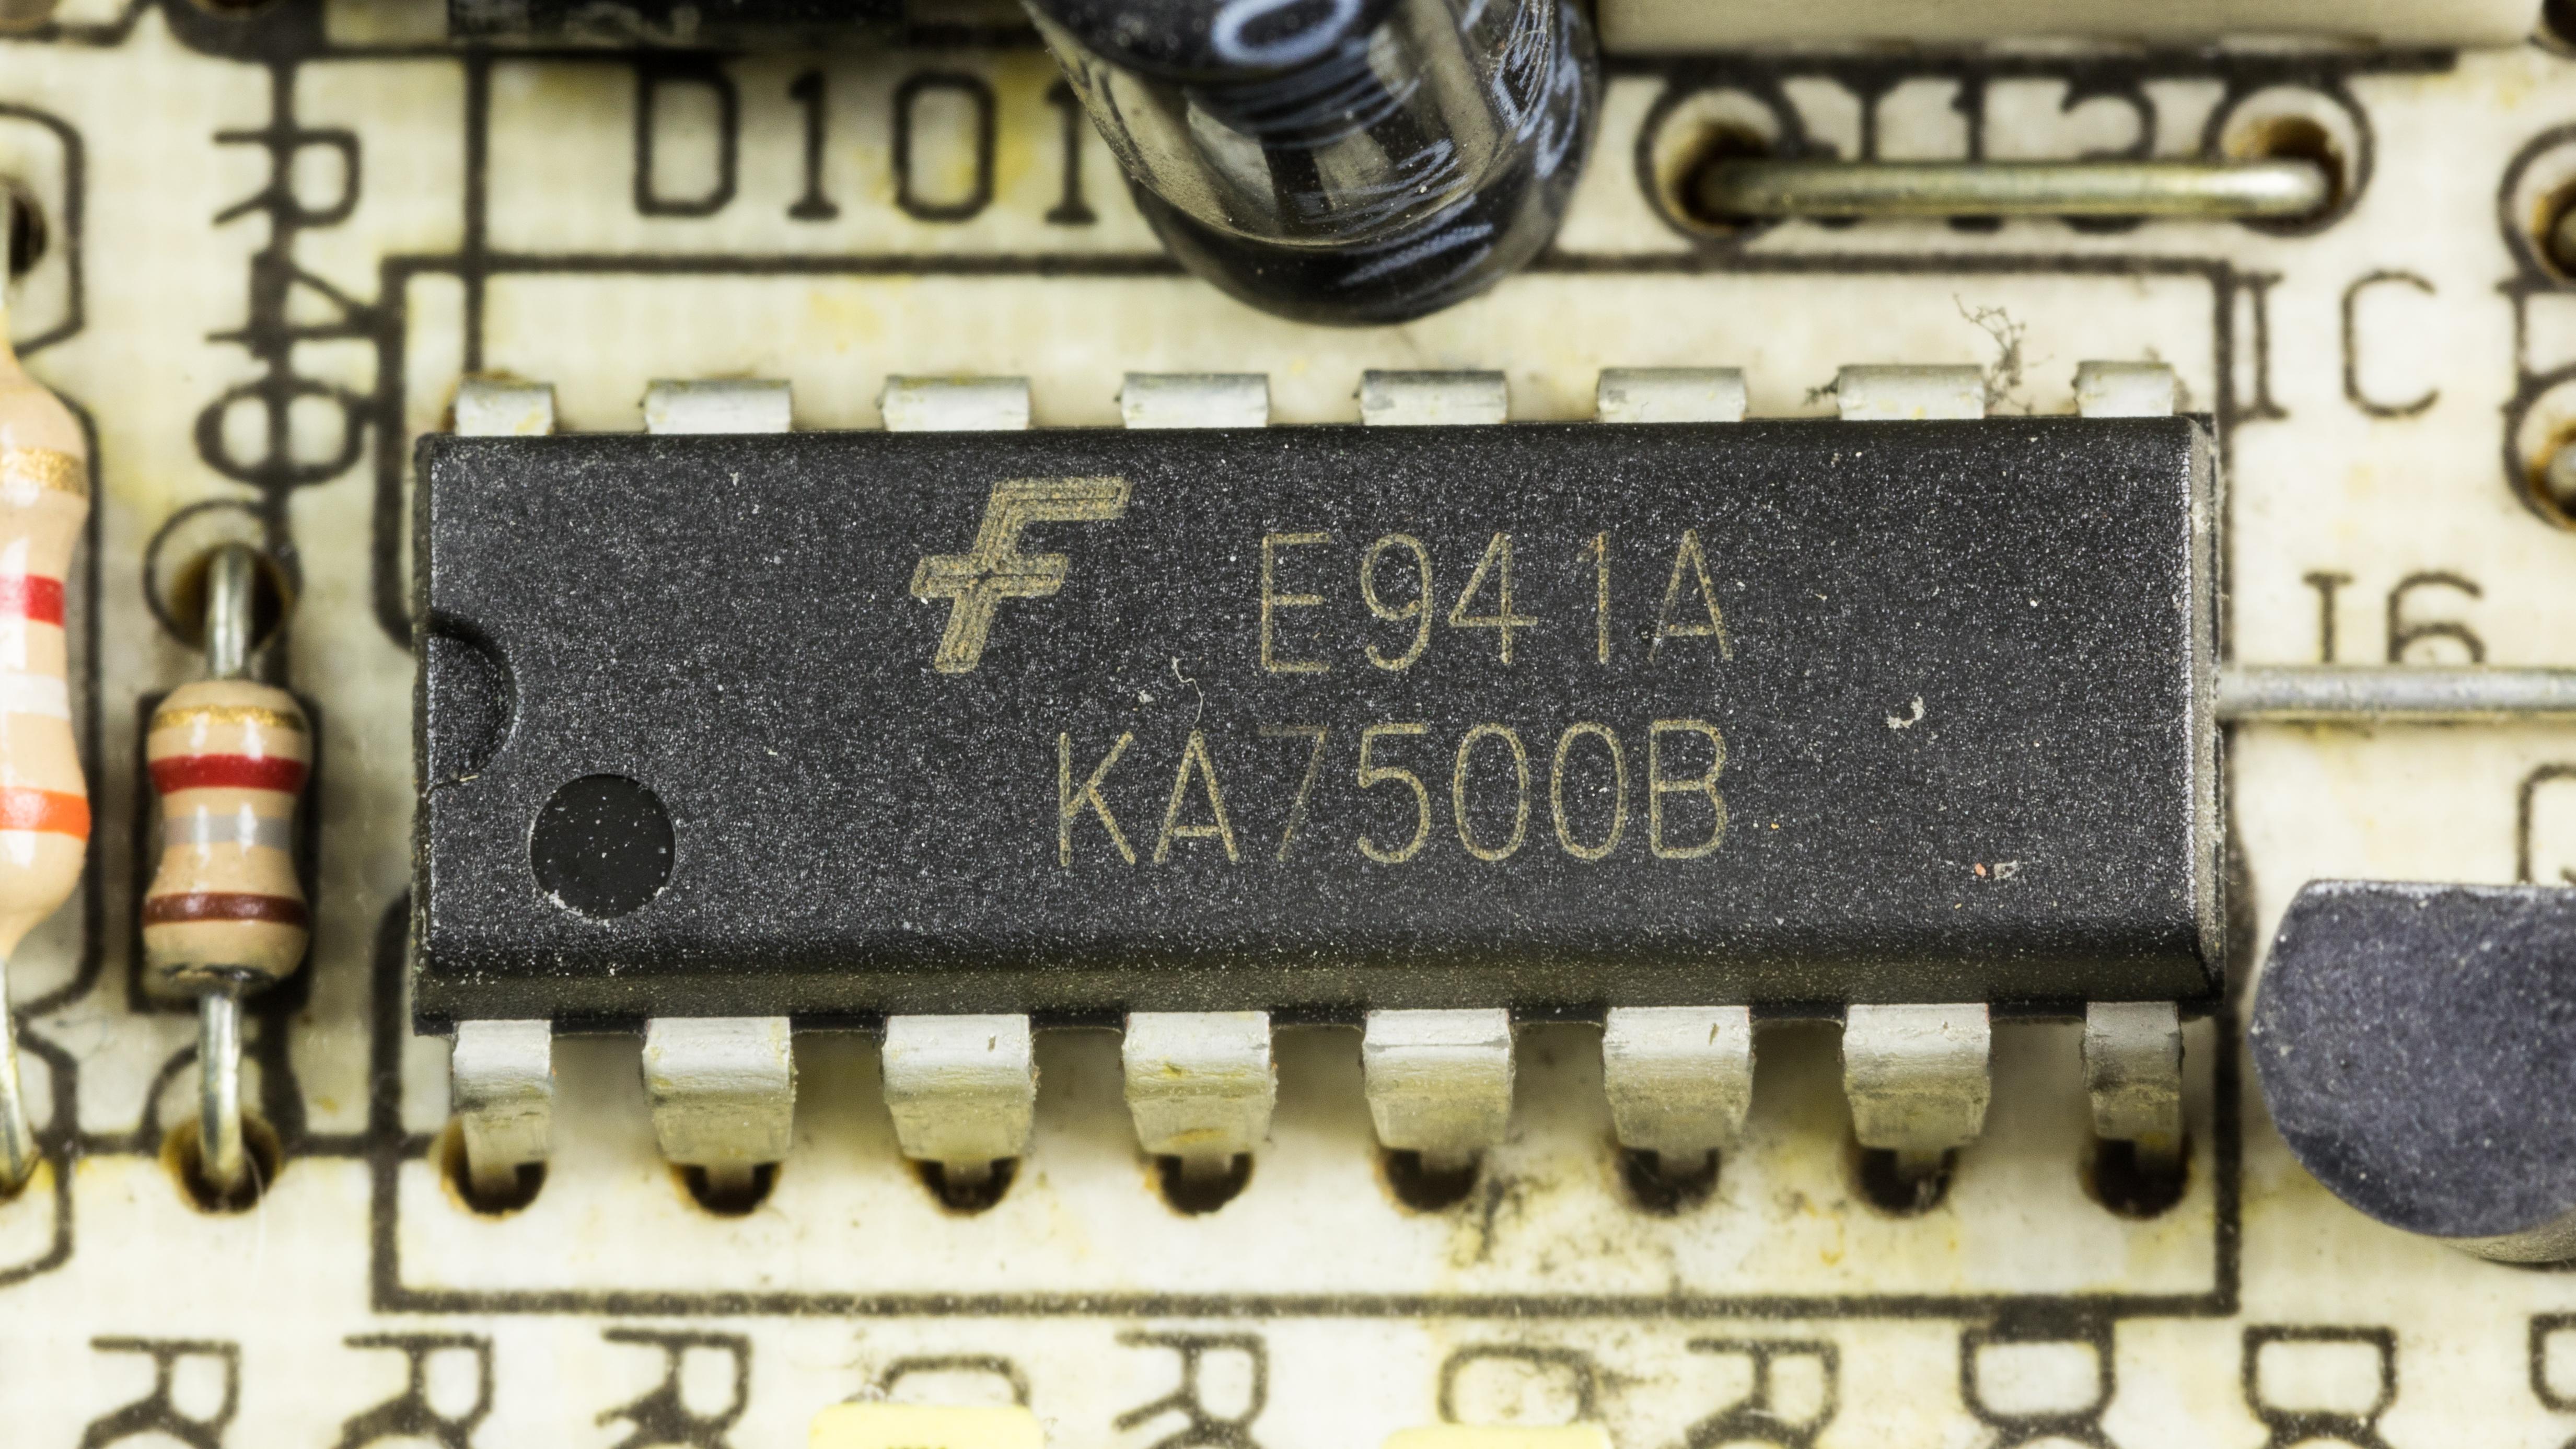 File:CWT-300ATX-A - Fairchild KA7500B-92647 jpg - Wikimedia Commons